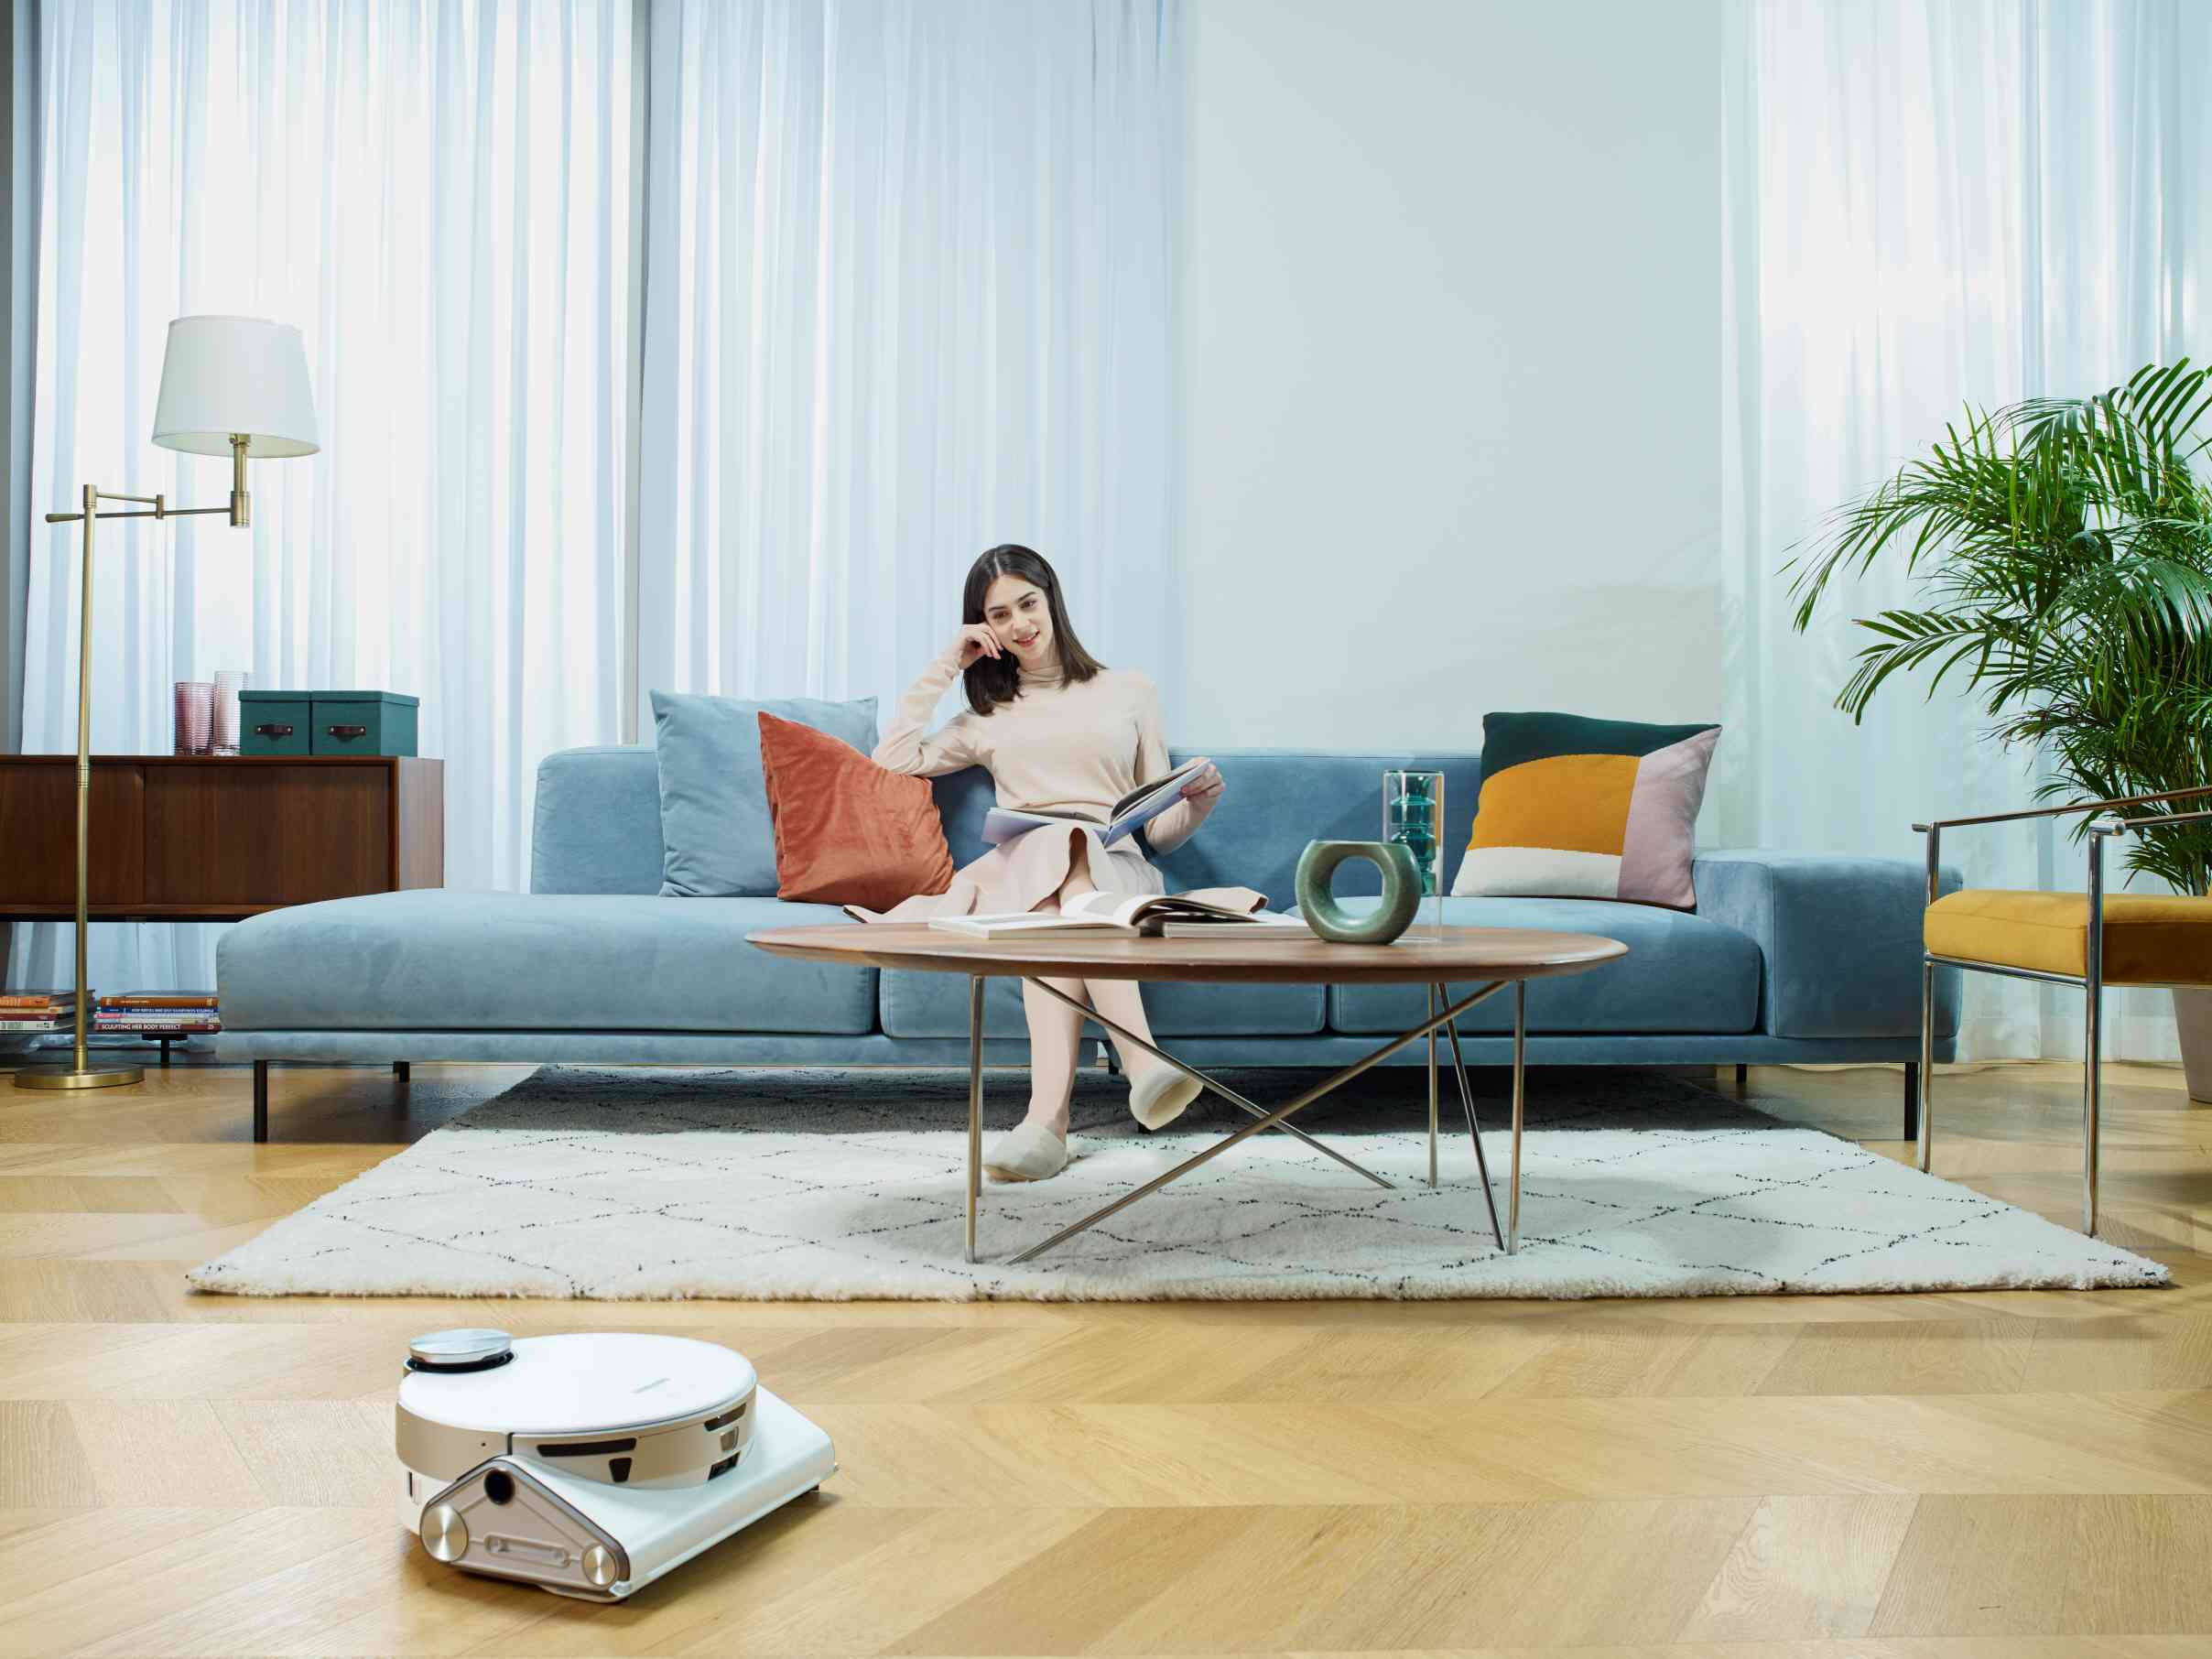 A Samsung Jetbot AI+ vacuuming a home.